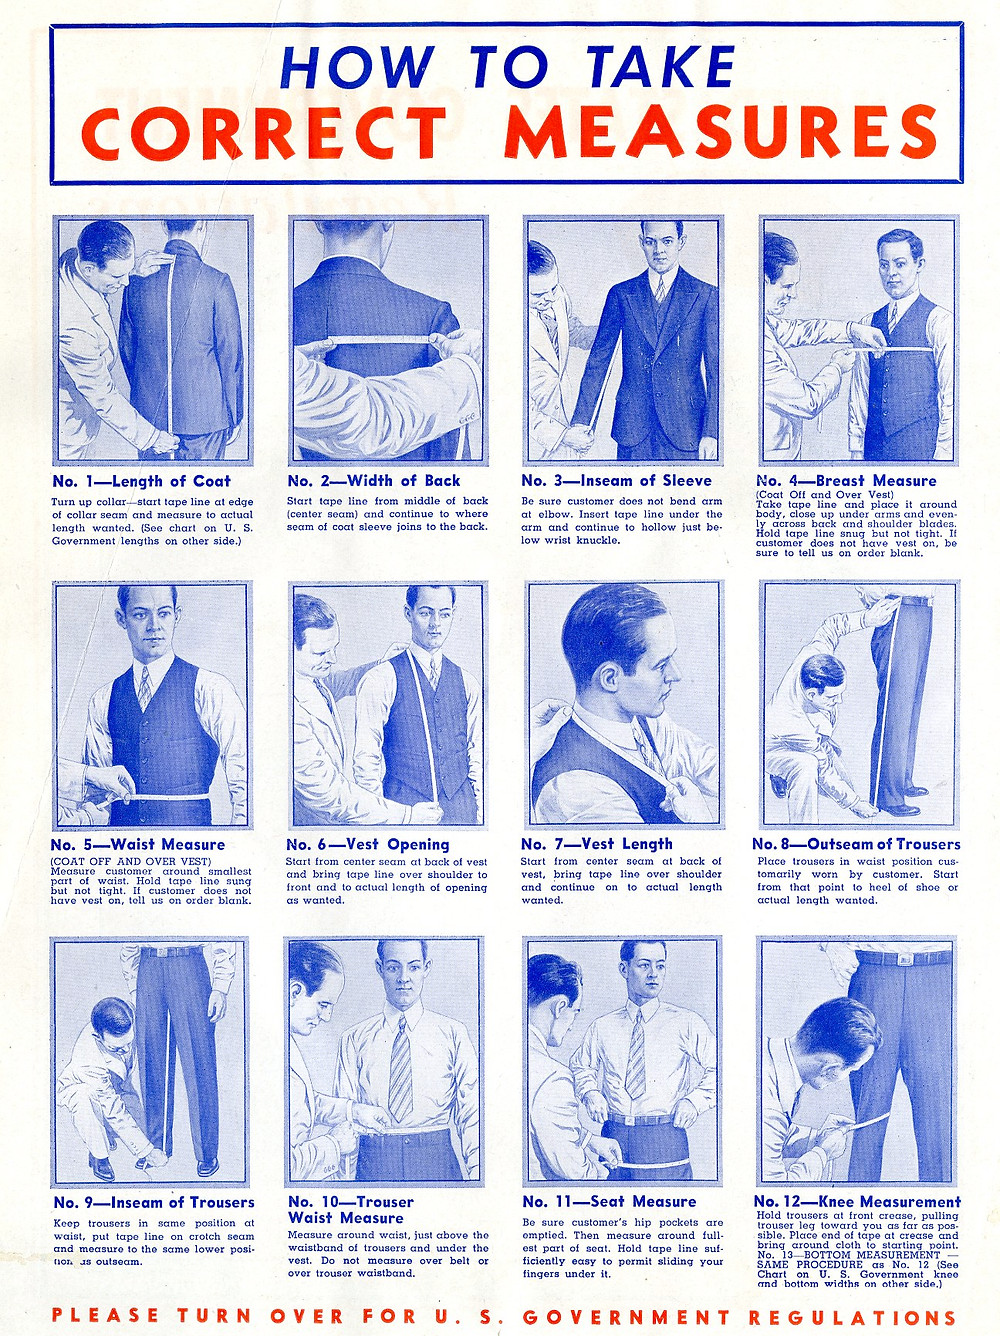 1940s fashion measurements